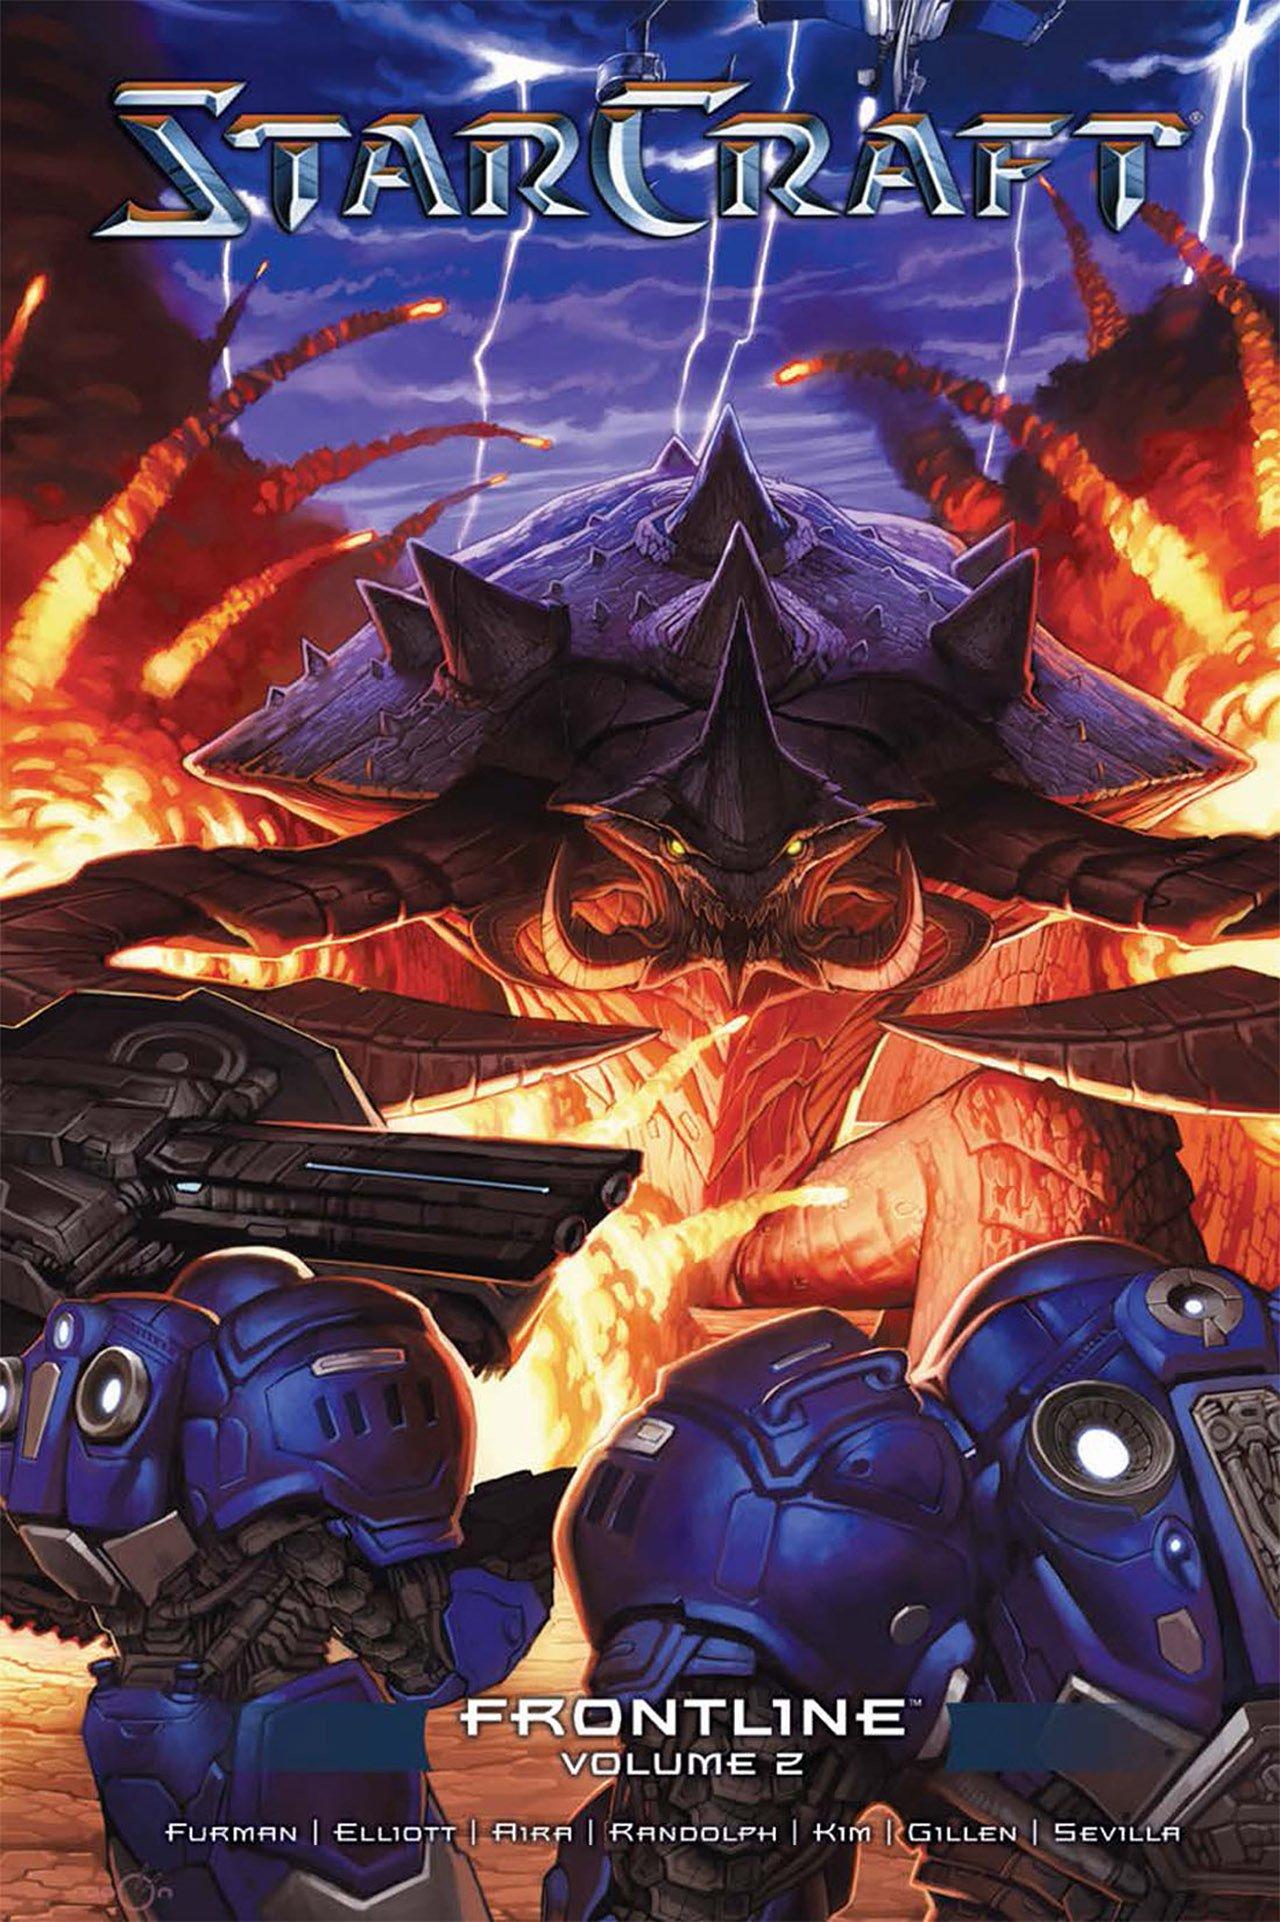 StarCraft - Frontline Vol.2 (January 2009)